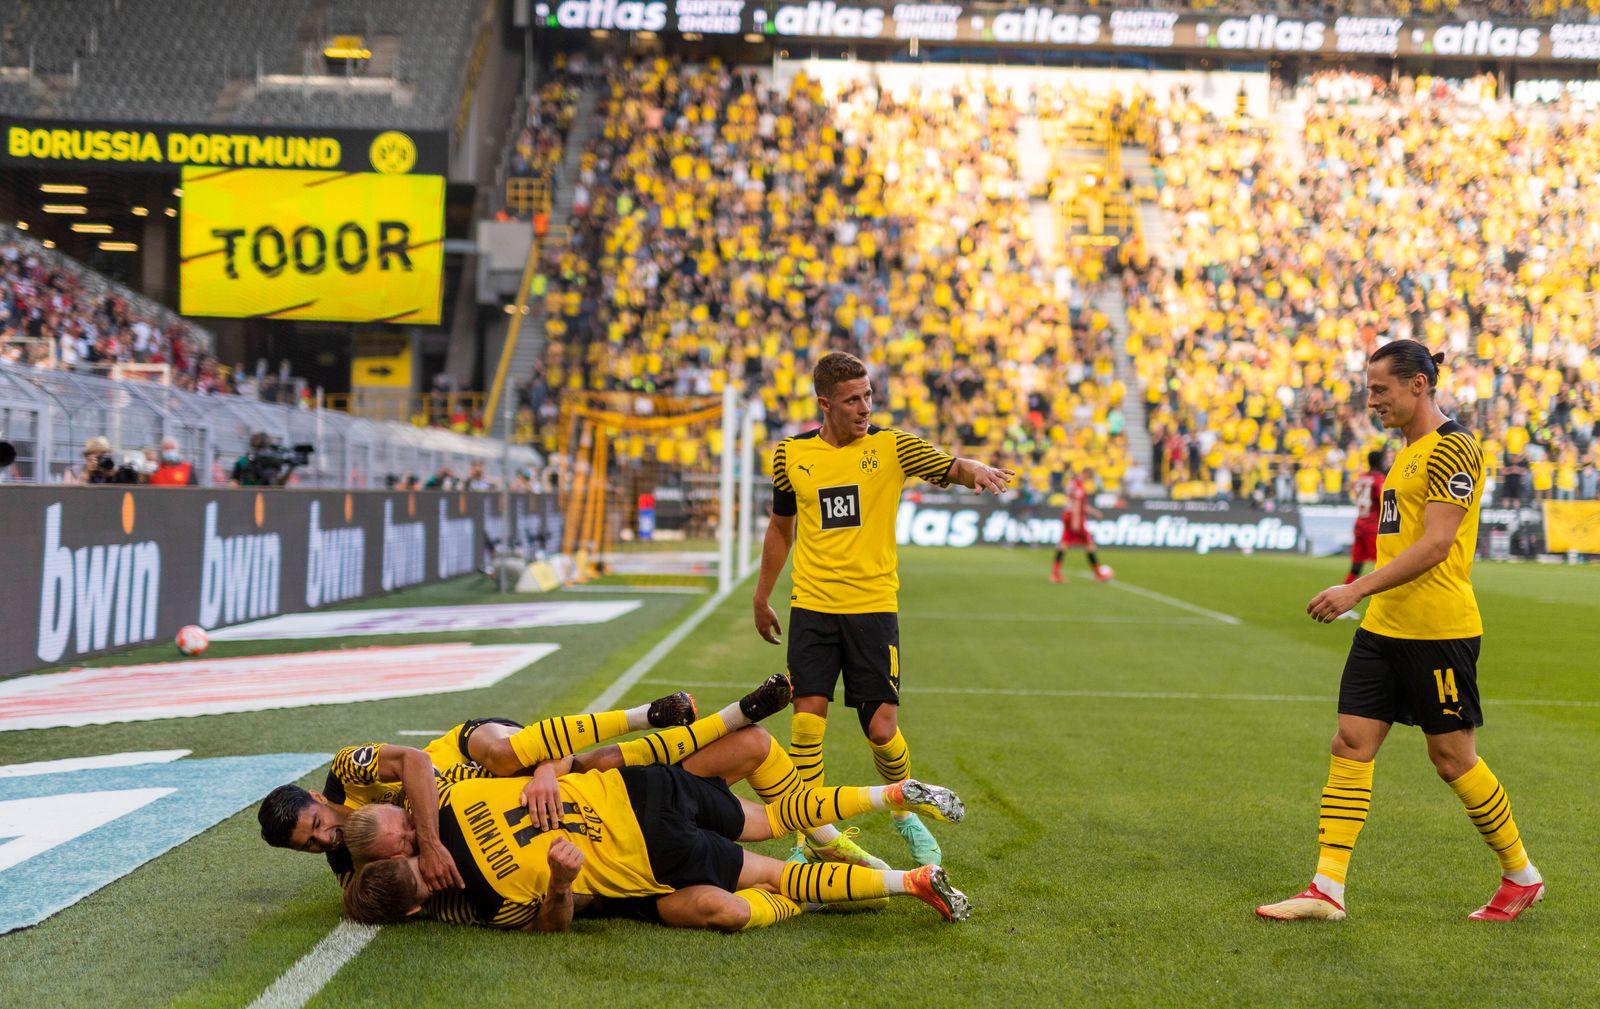 Torjubel: Mahmoud Dahoud (BVB), Marco Reus (BVB), Erling Haaland (BVB), Thorgan Hazard (BVB), Nico Schulz (BVB) Borussia